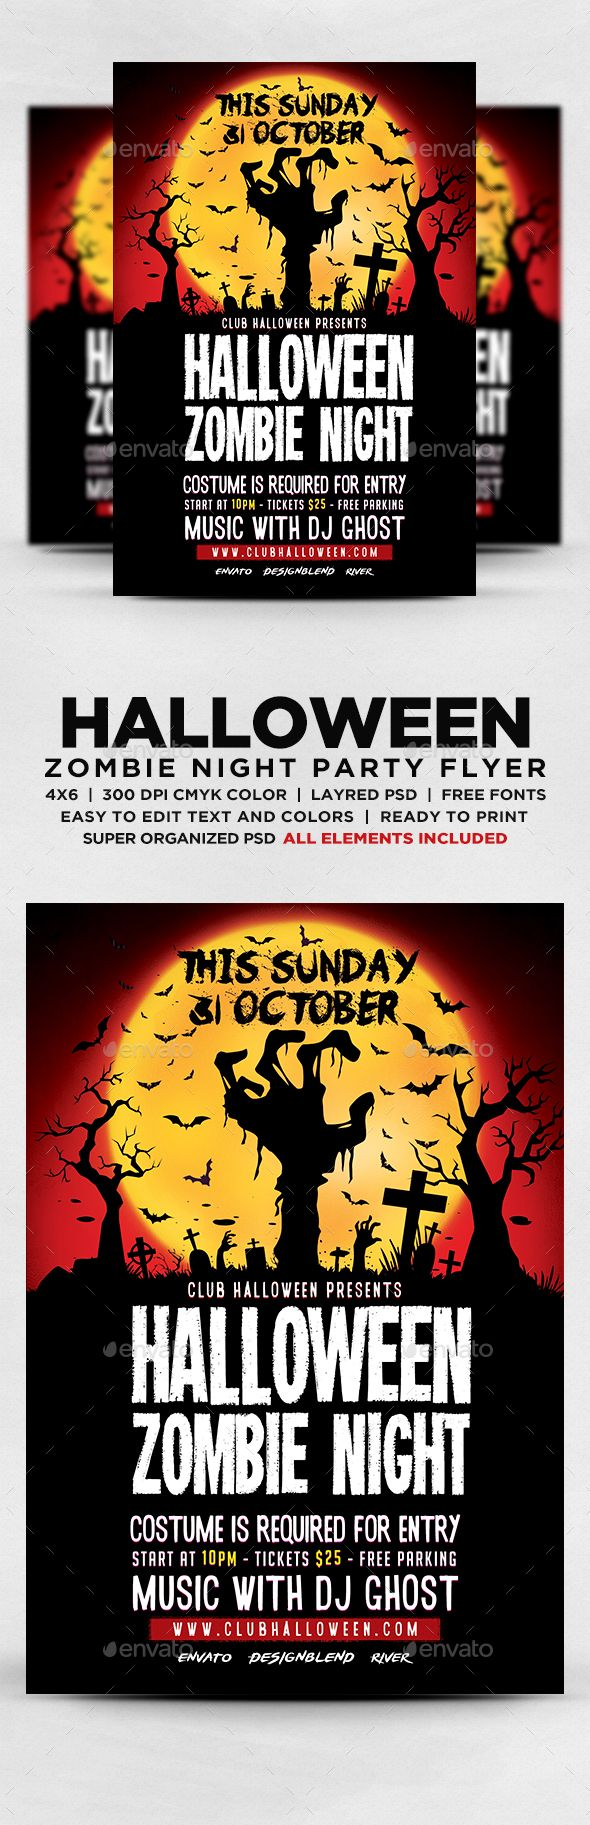 Halloween Zombie Night Flyer Template PSD | Halloween Flyer ...